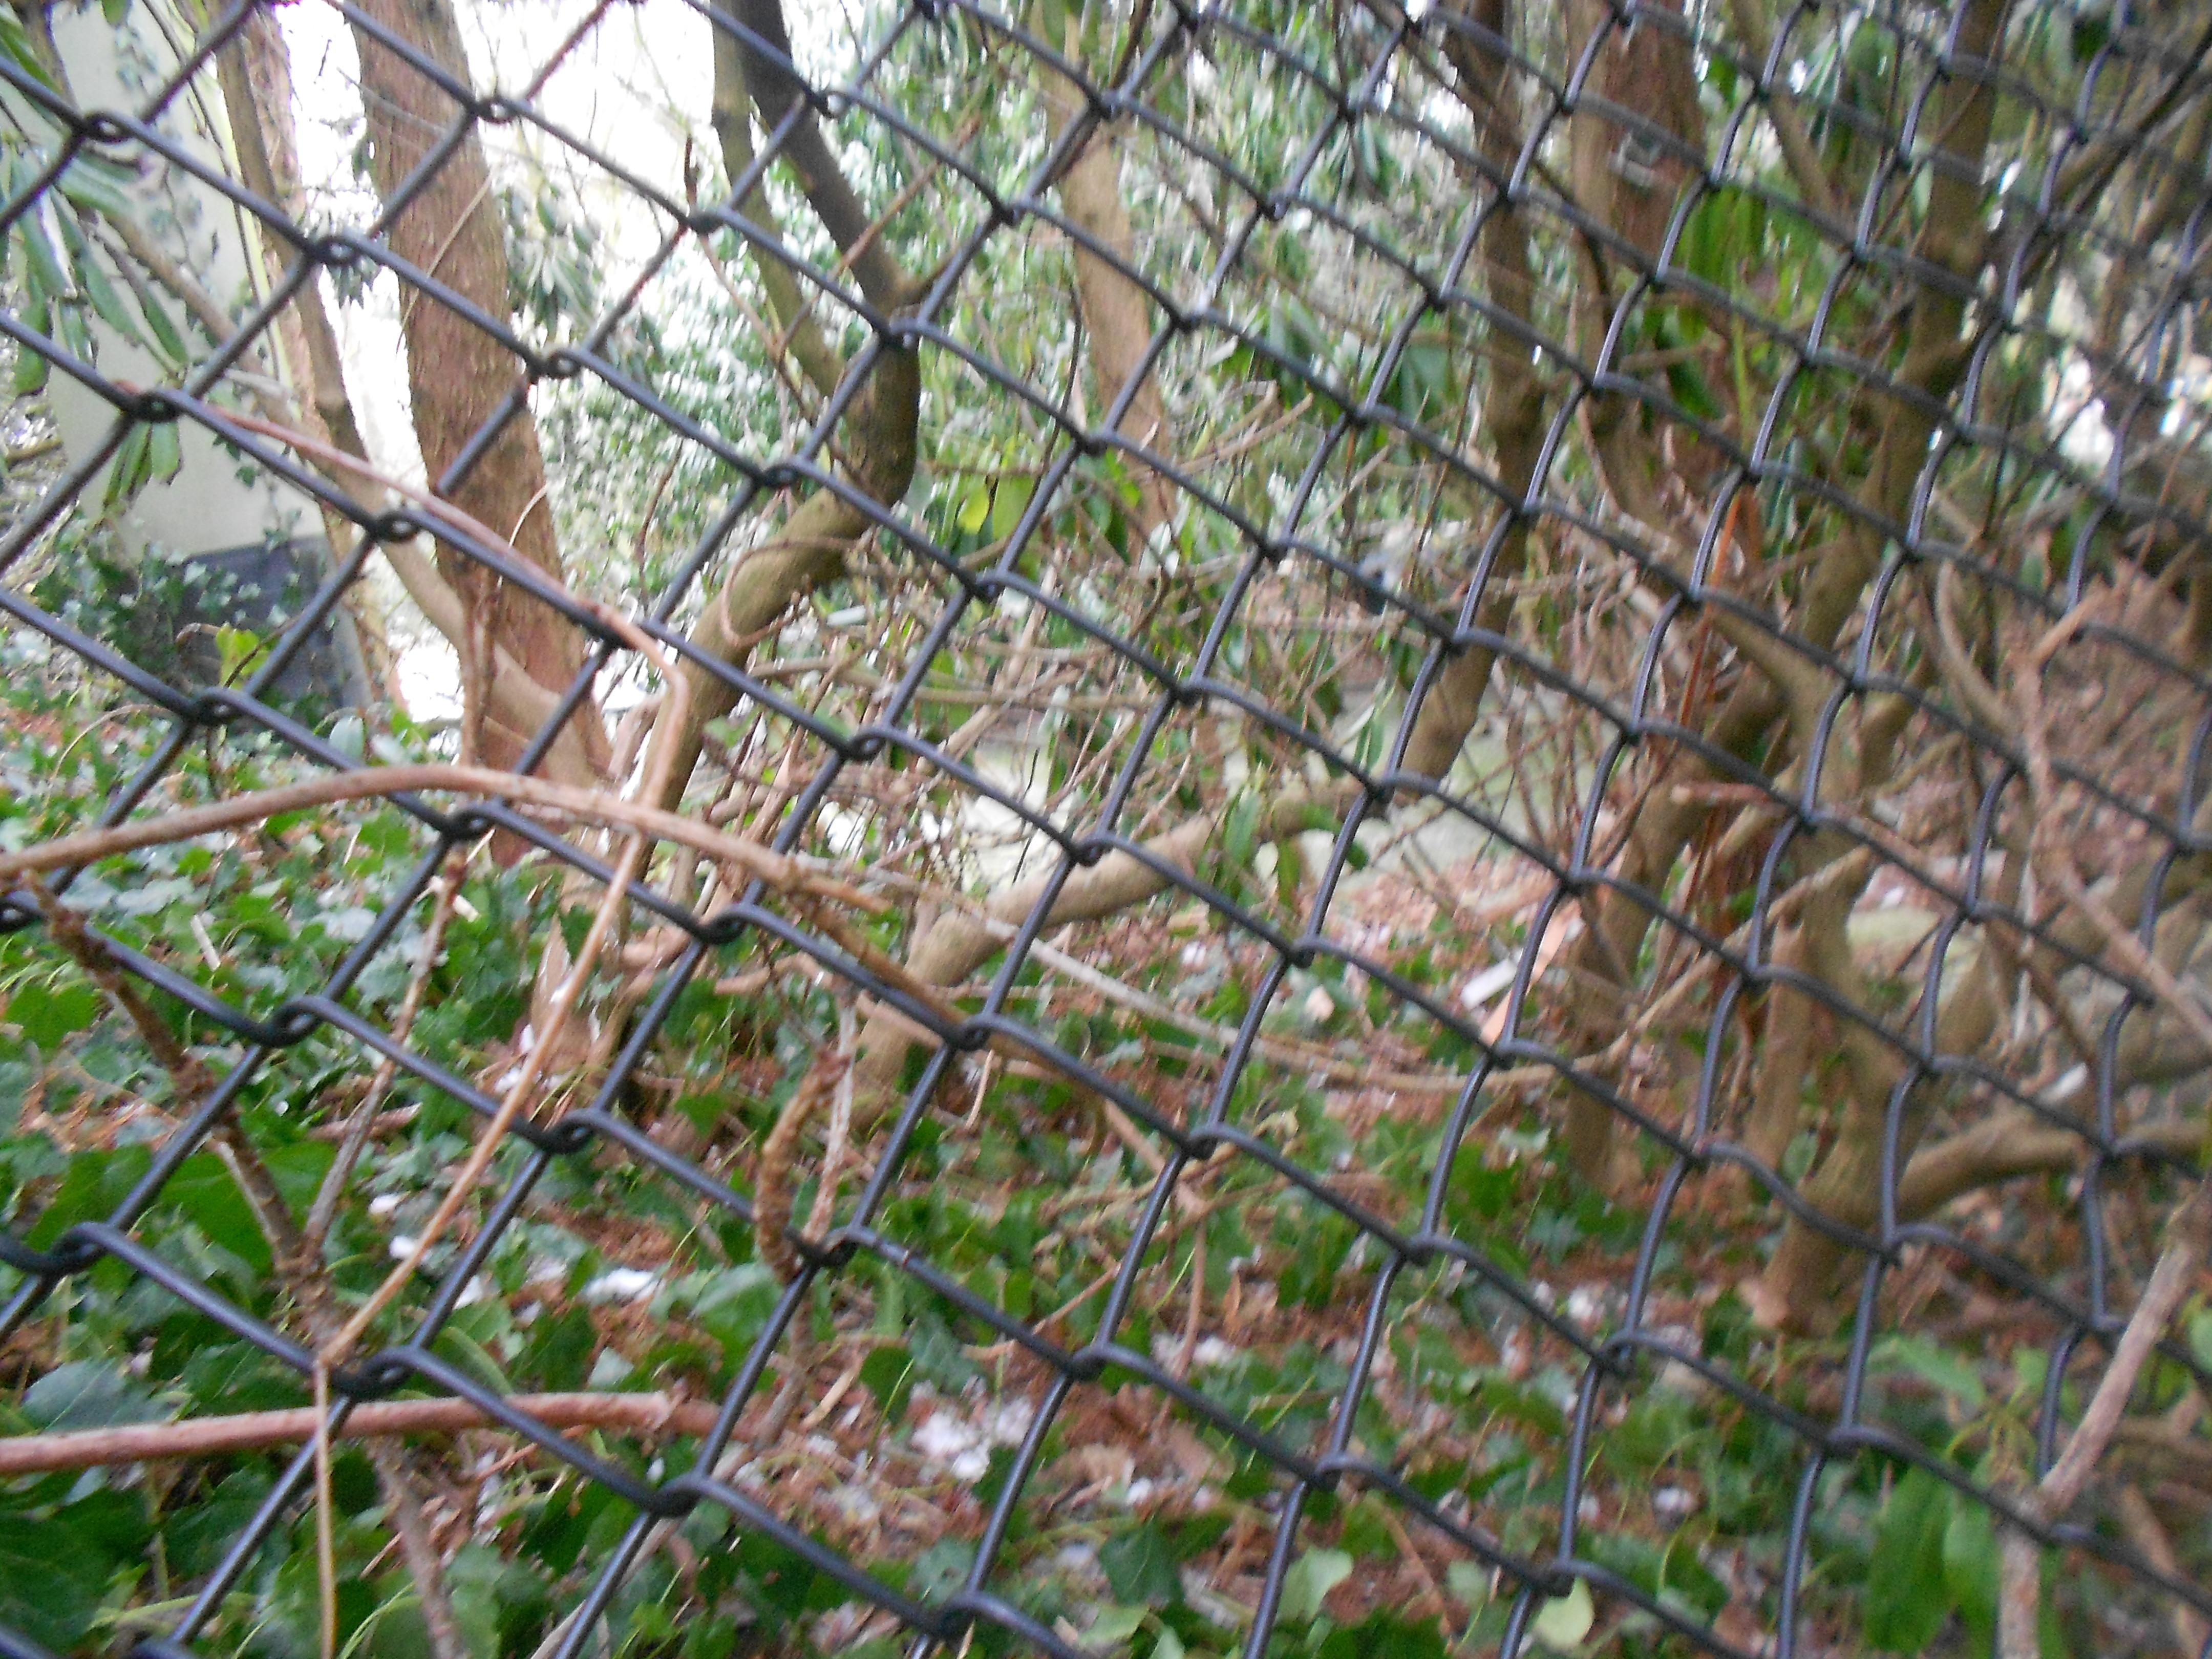 Dierenpark Emmen - American Free-flight aviary (3)